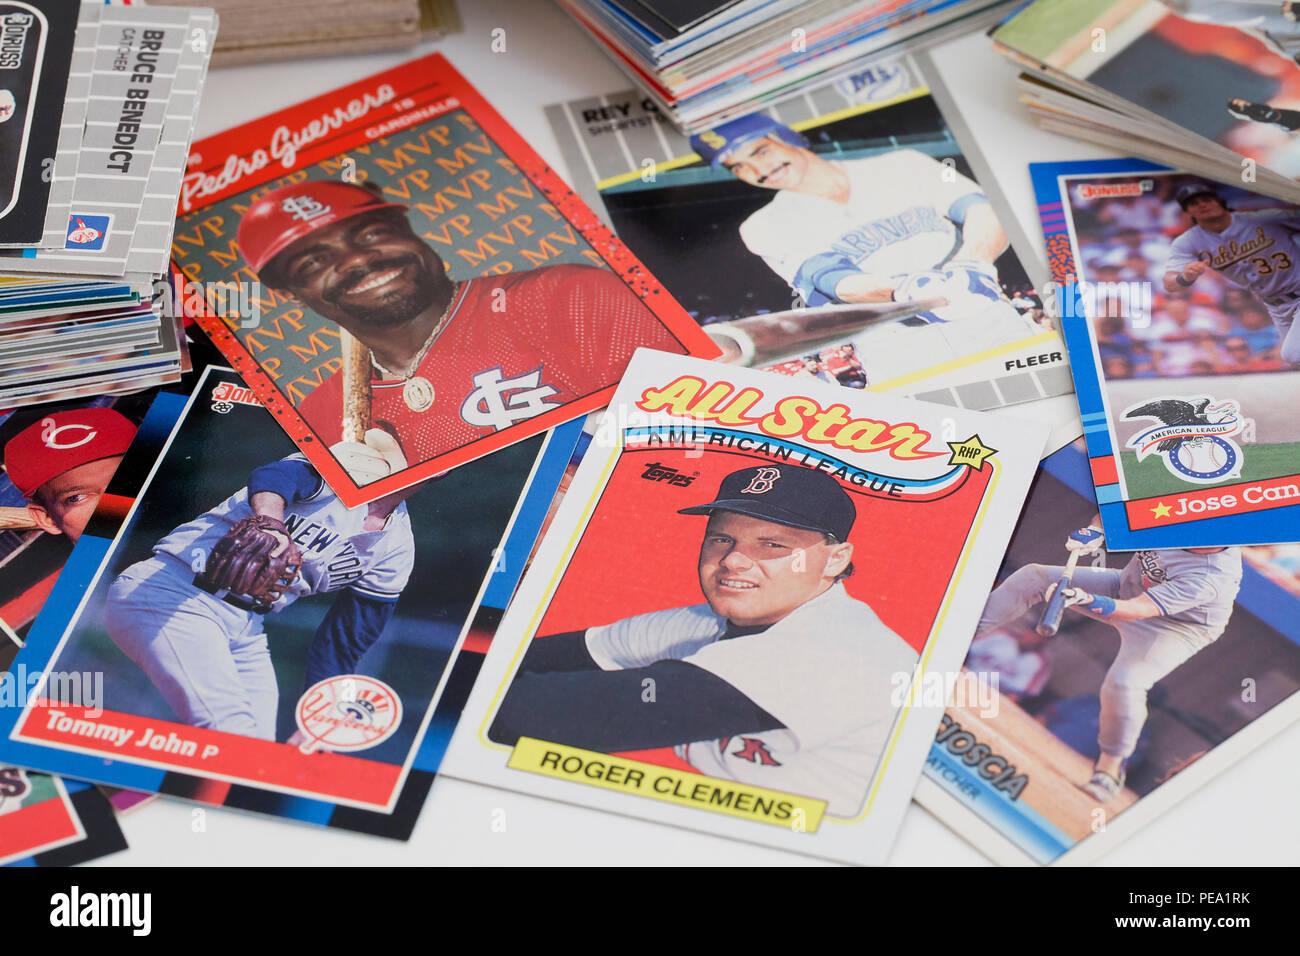 Baseball Card Stock Photos Baseball Card Stock Images Alamy